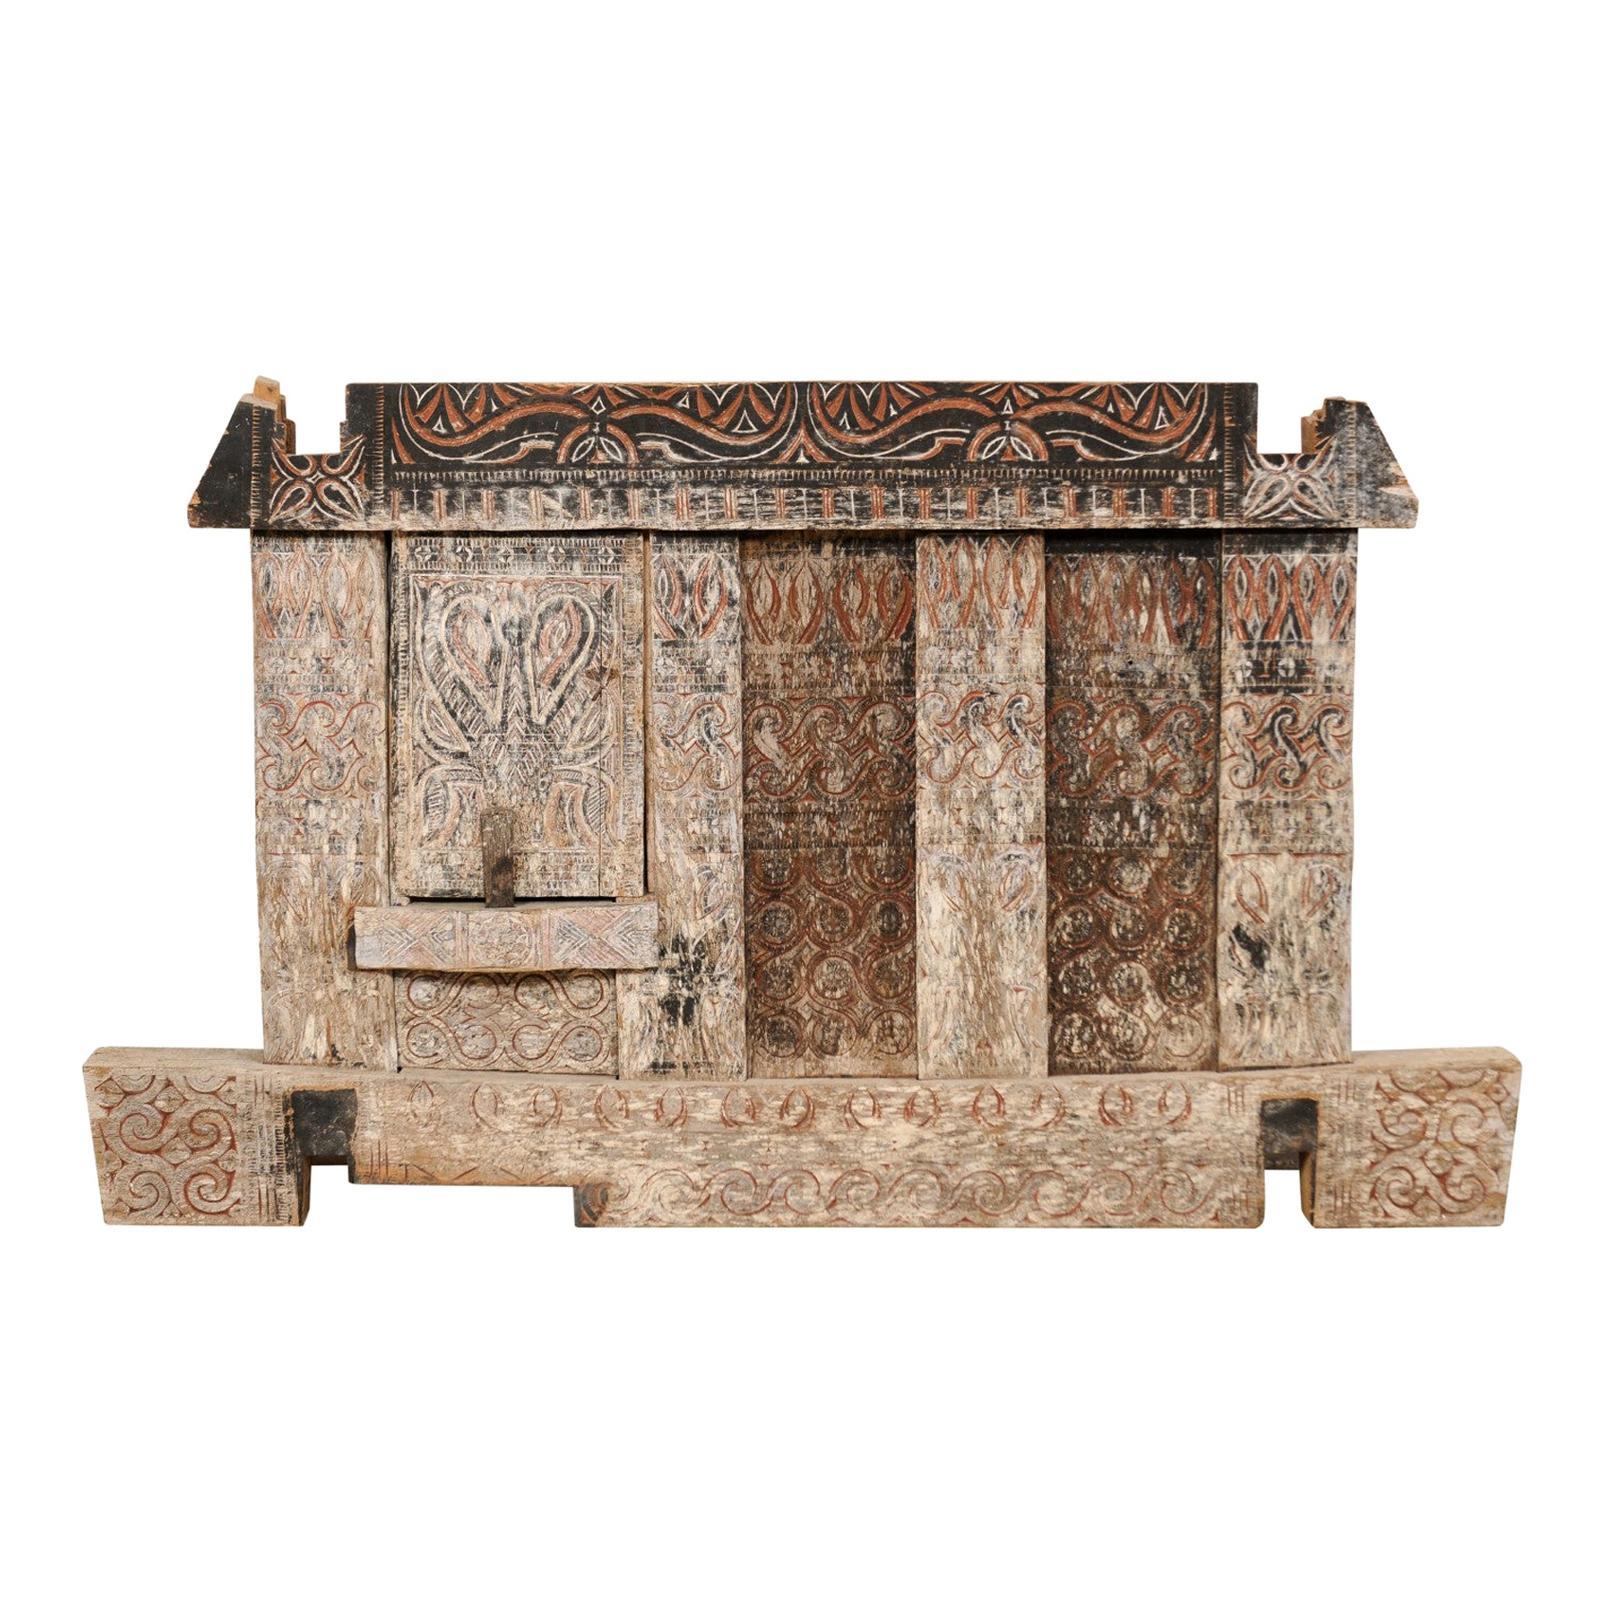 19th Century Toroja Wooden Granary Panel from Sulawesi